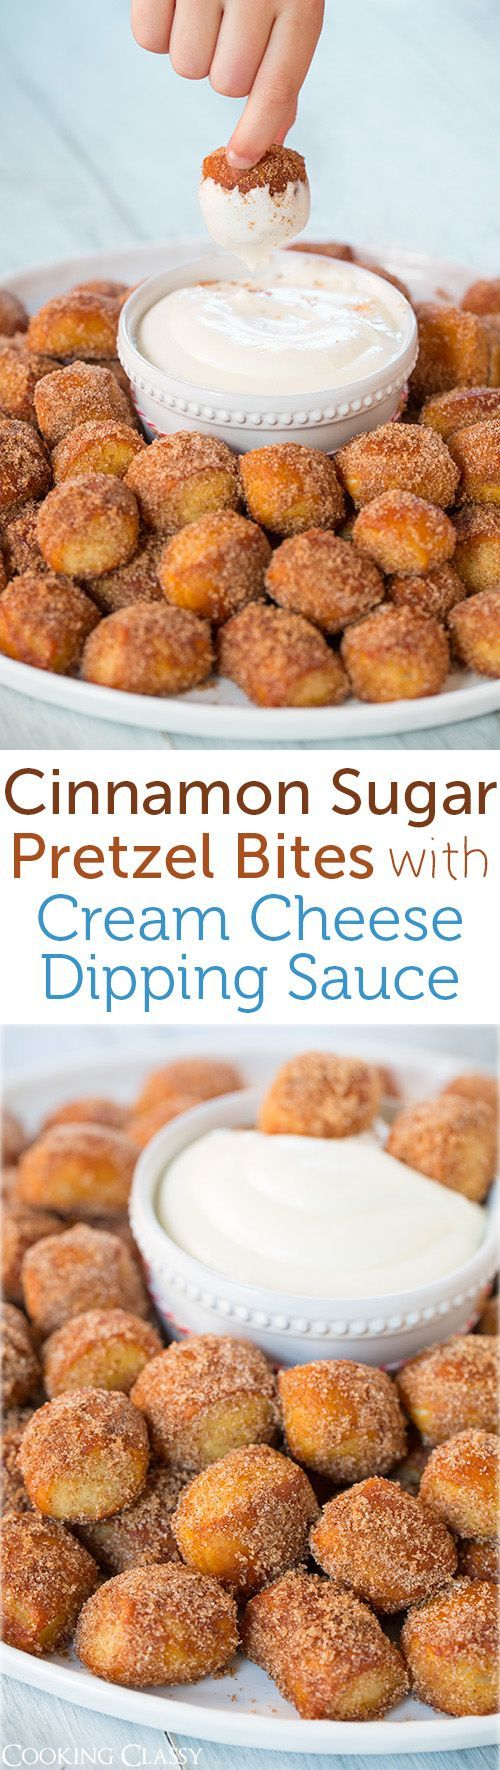 Copycat Auntie Annes Cinnamon Sugar Pretzel Bites with Cream Cheese Dipping…